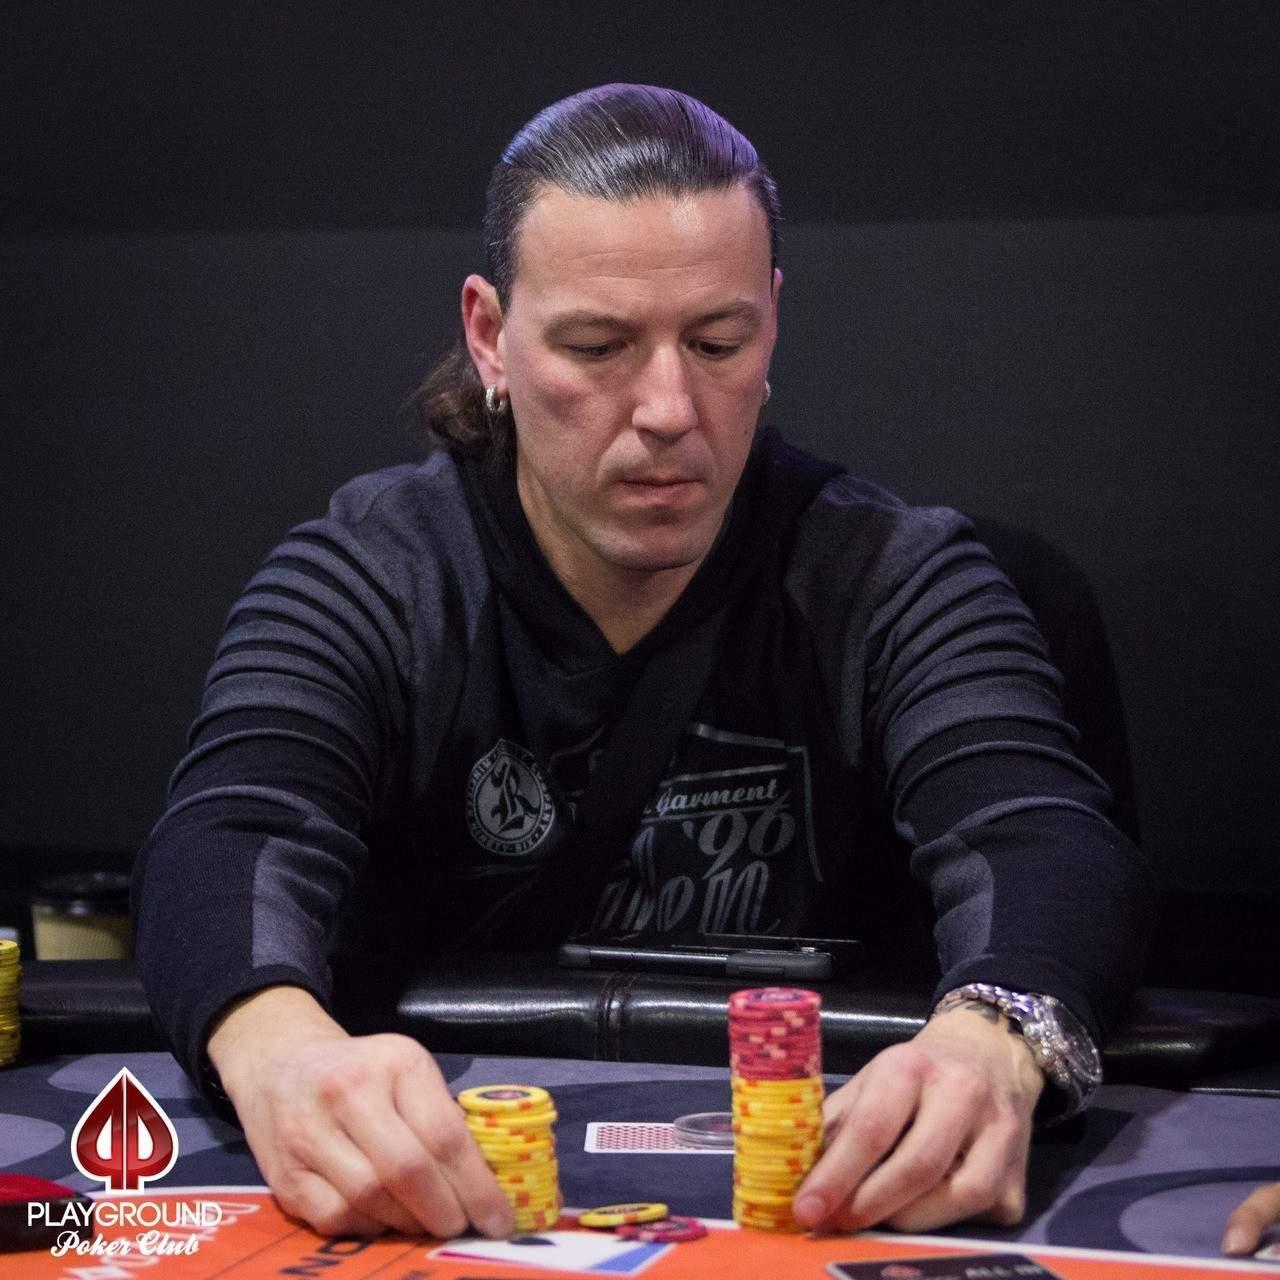 Marco sousa poker casino saint paul les dax restaurant